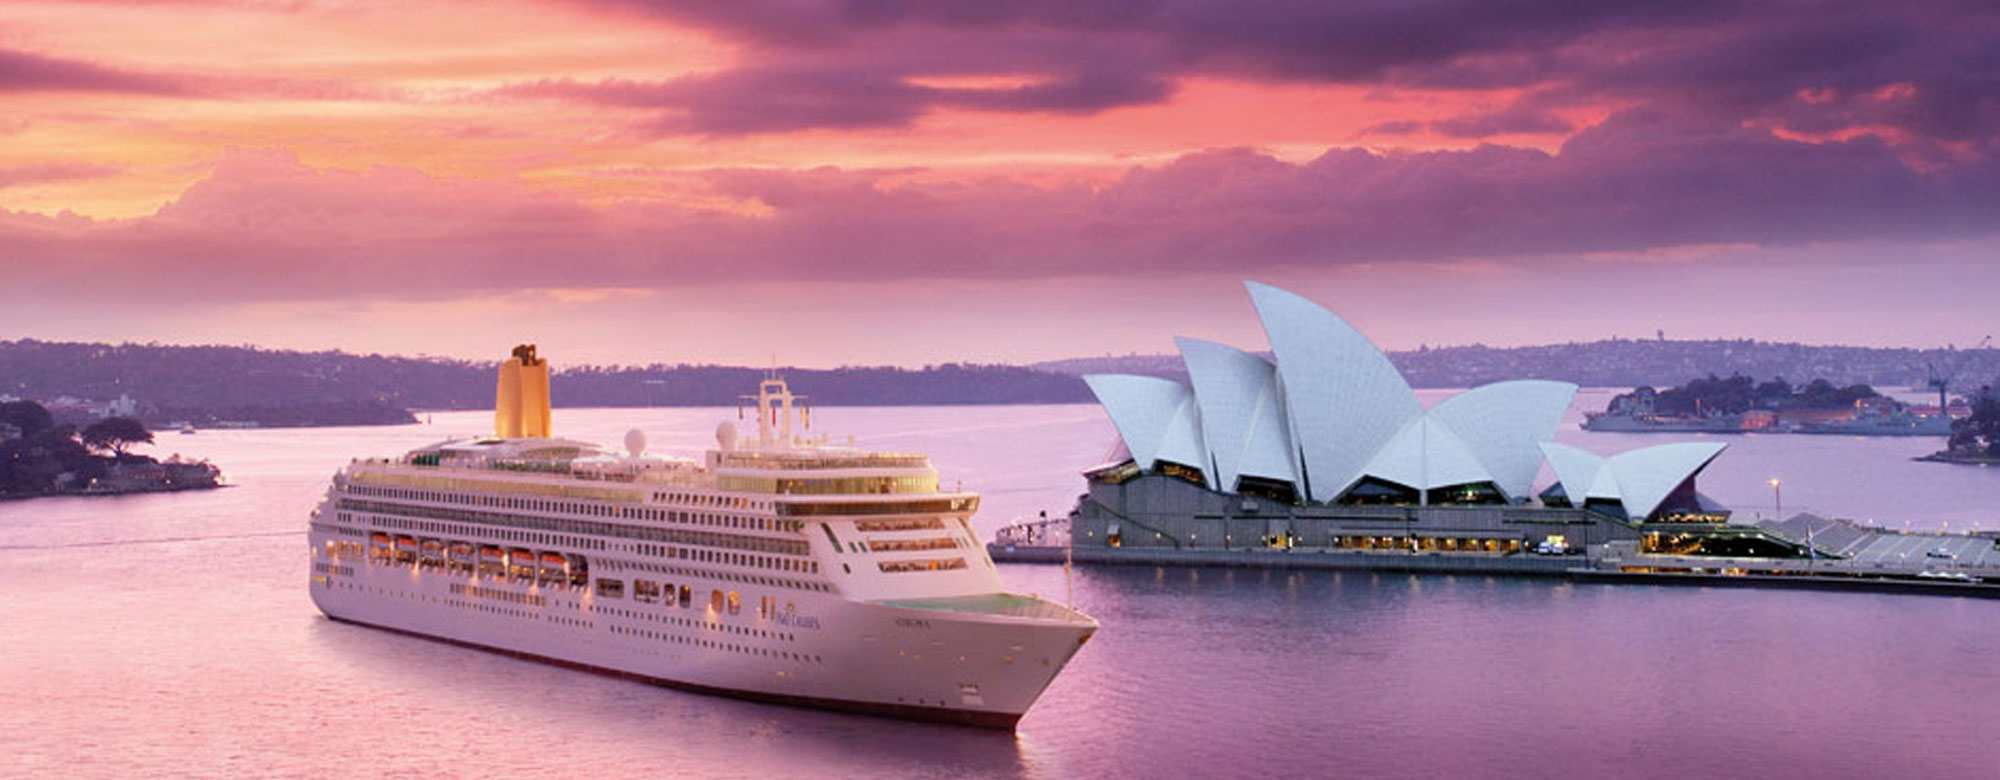 p & o Ocean Liner sydney opera house